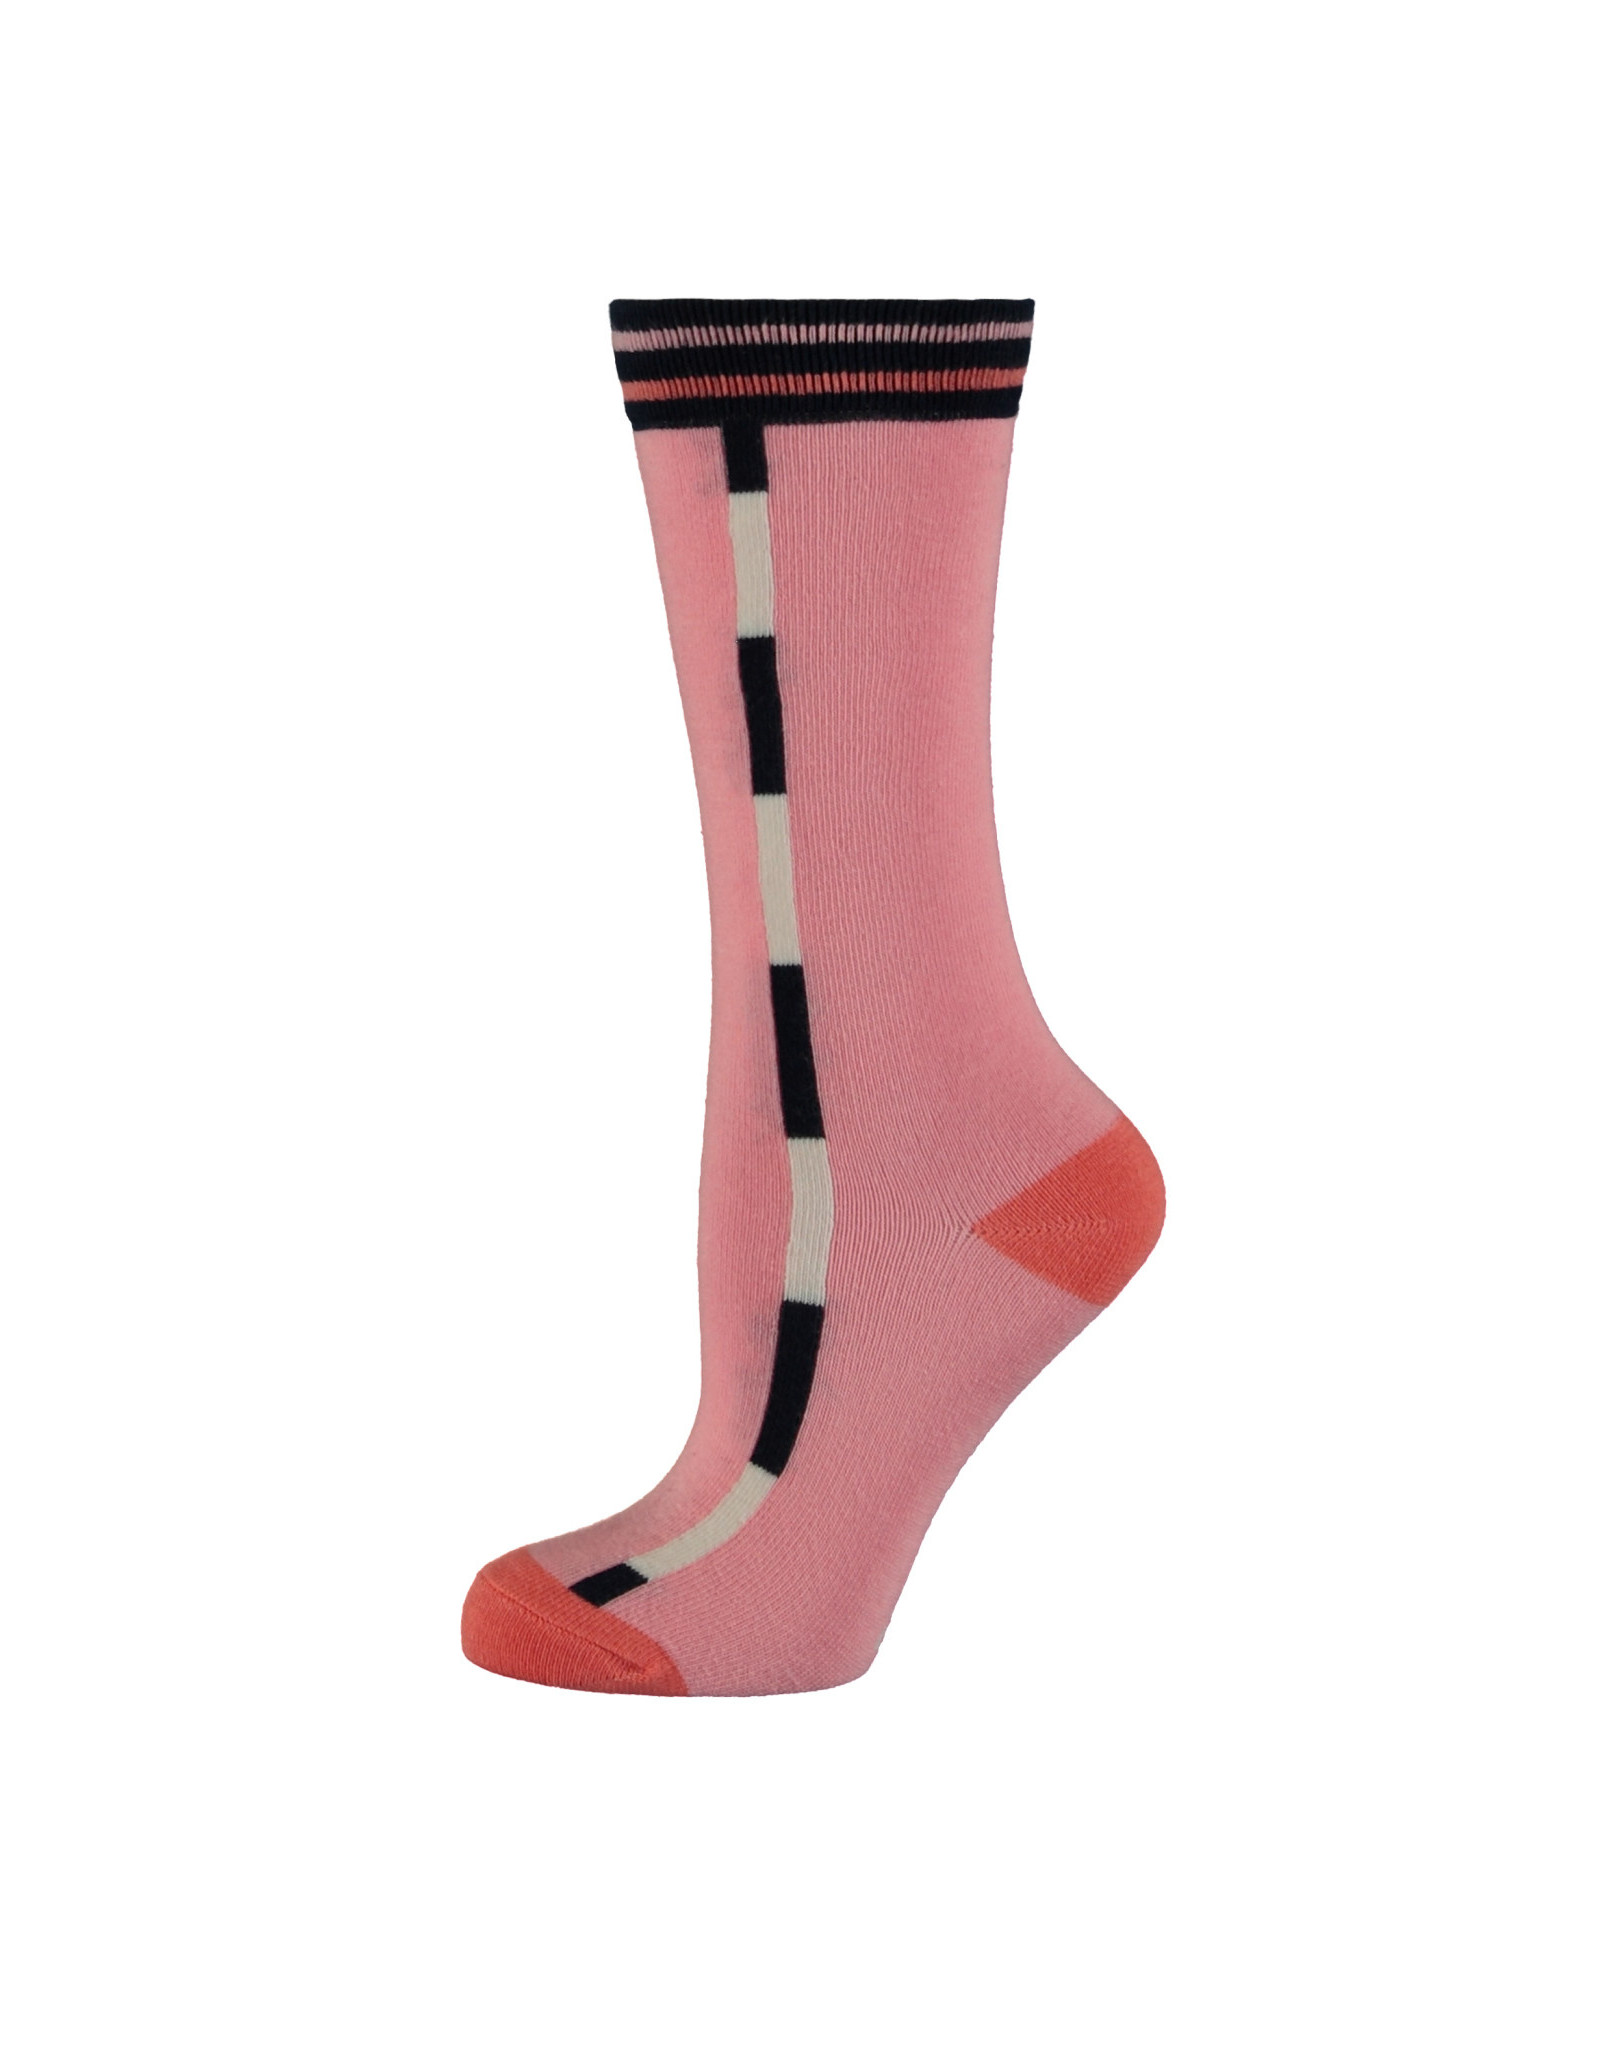 Bampidano Bampidano meisjes sokken Diore Light Pink